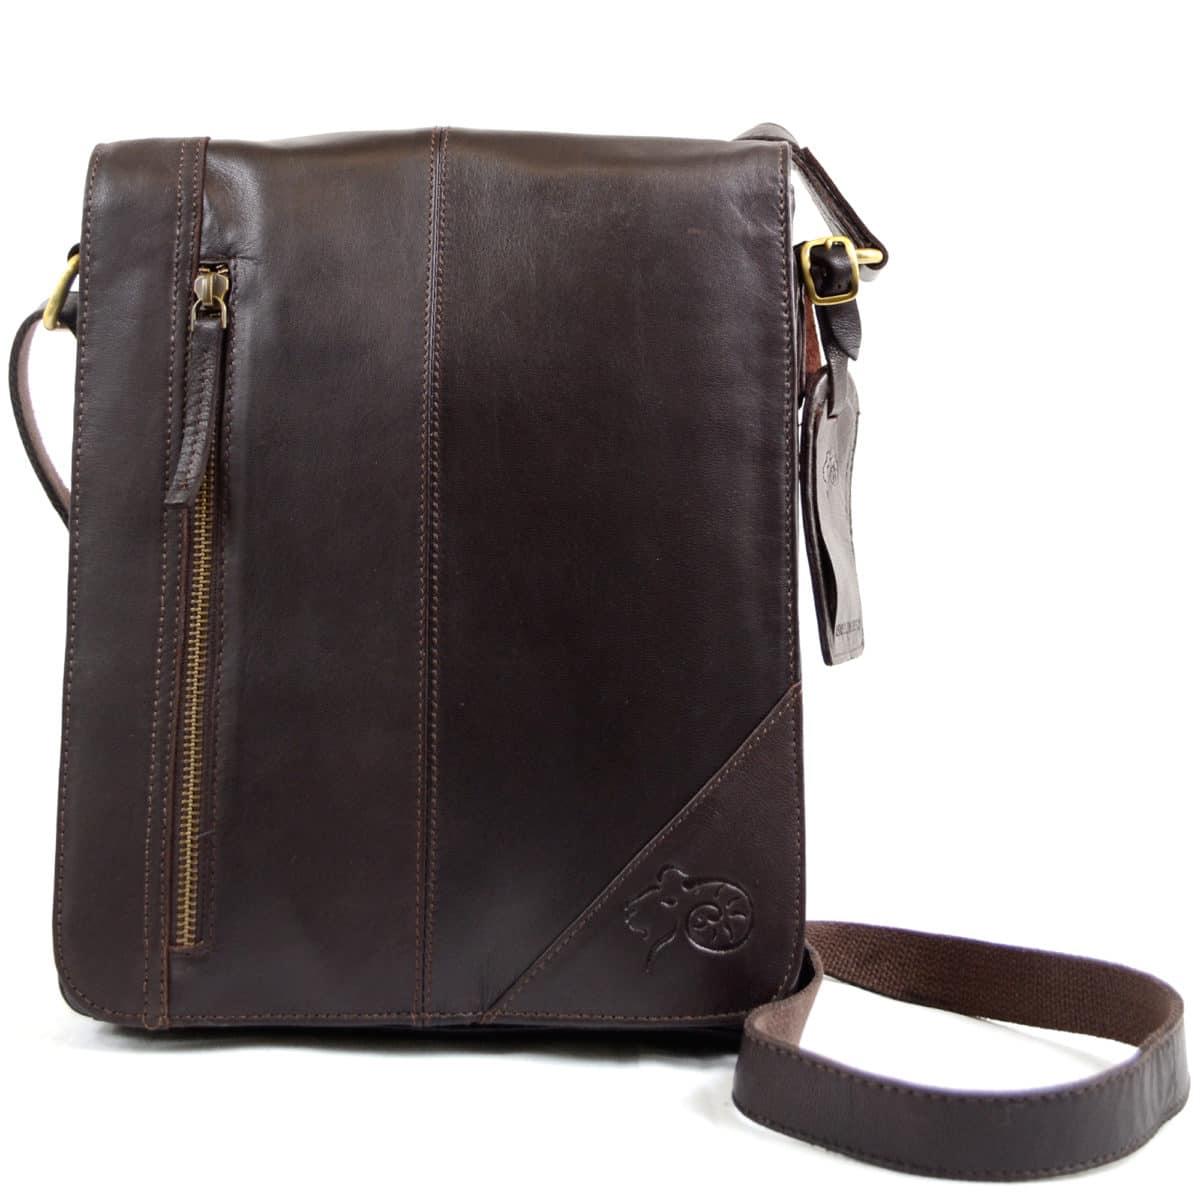 Leather Messenger Bag - Brown